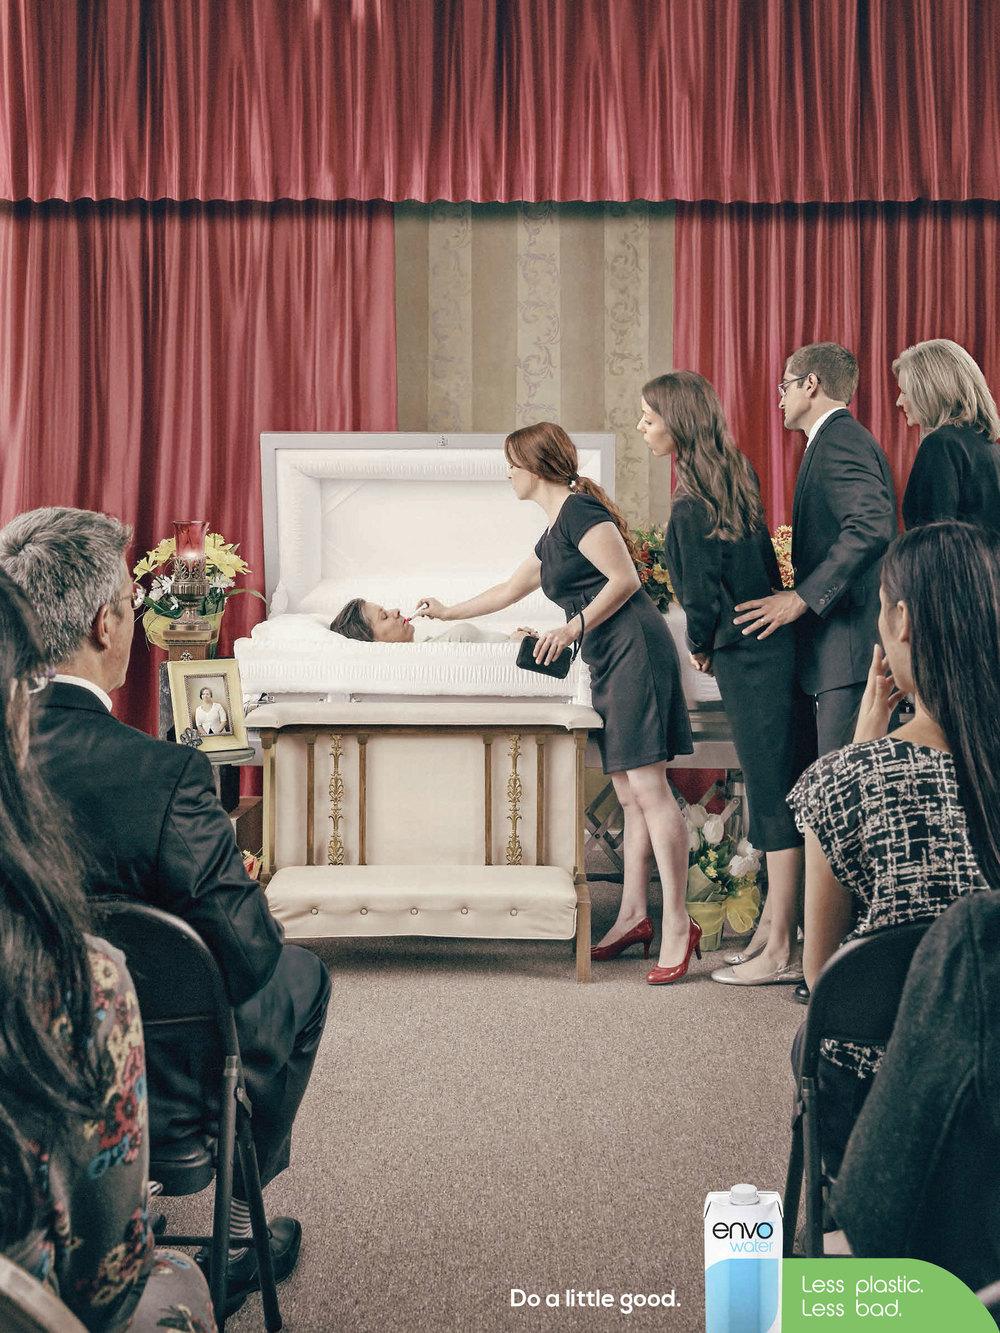 envo-poster-funeral.jpg